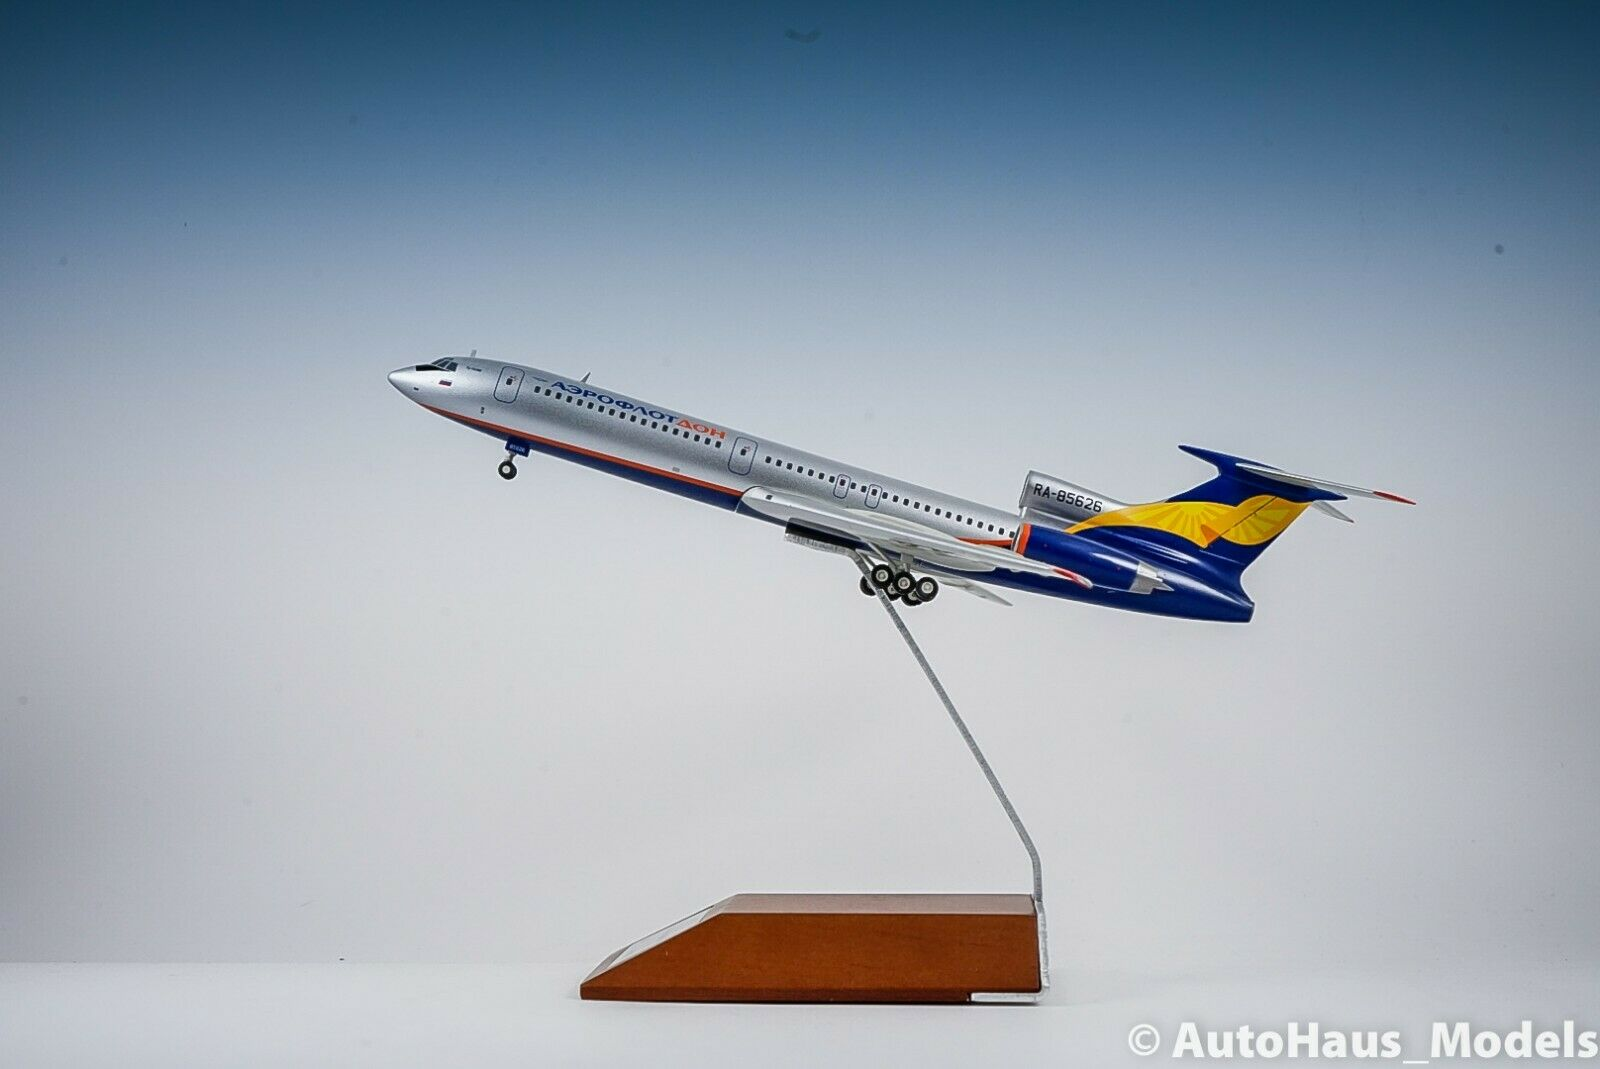 1 200 JC WINGS AEROFMasse DON TU-154M Passenger Airplane Diecast Aircraft Modell